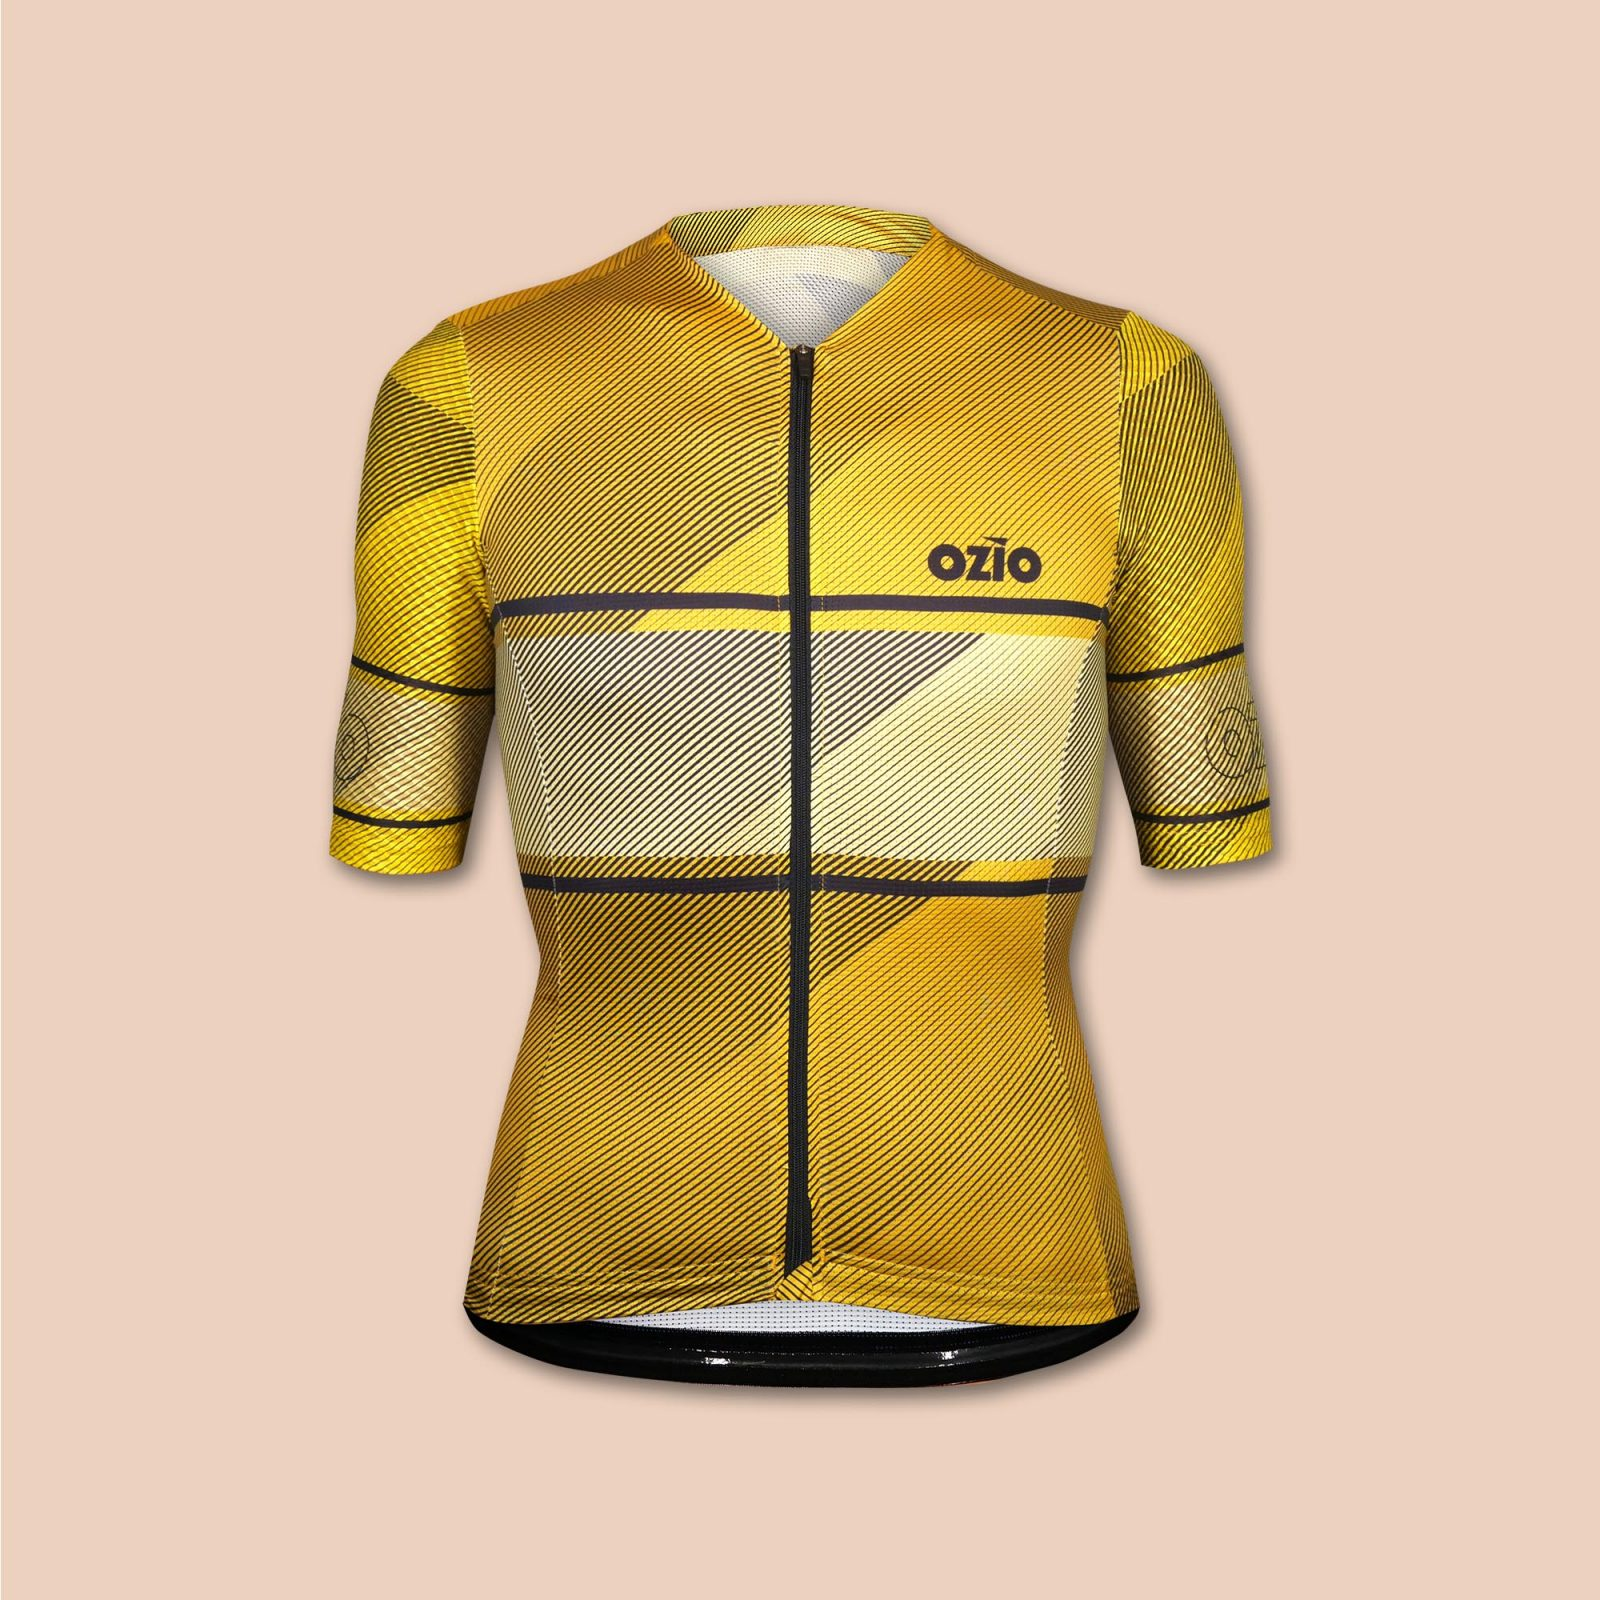 maillot cycliste jaune